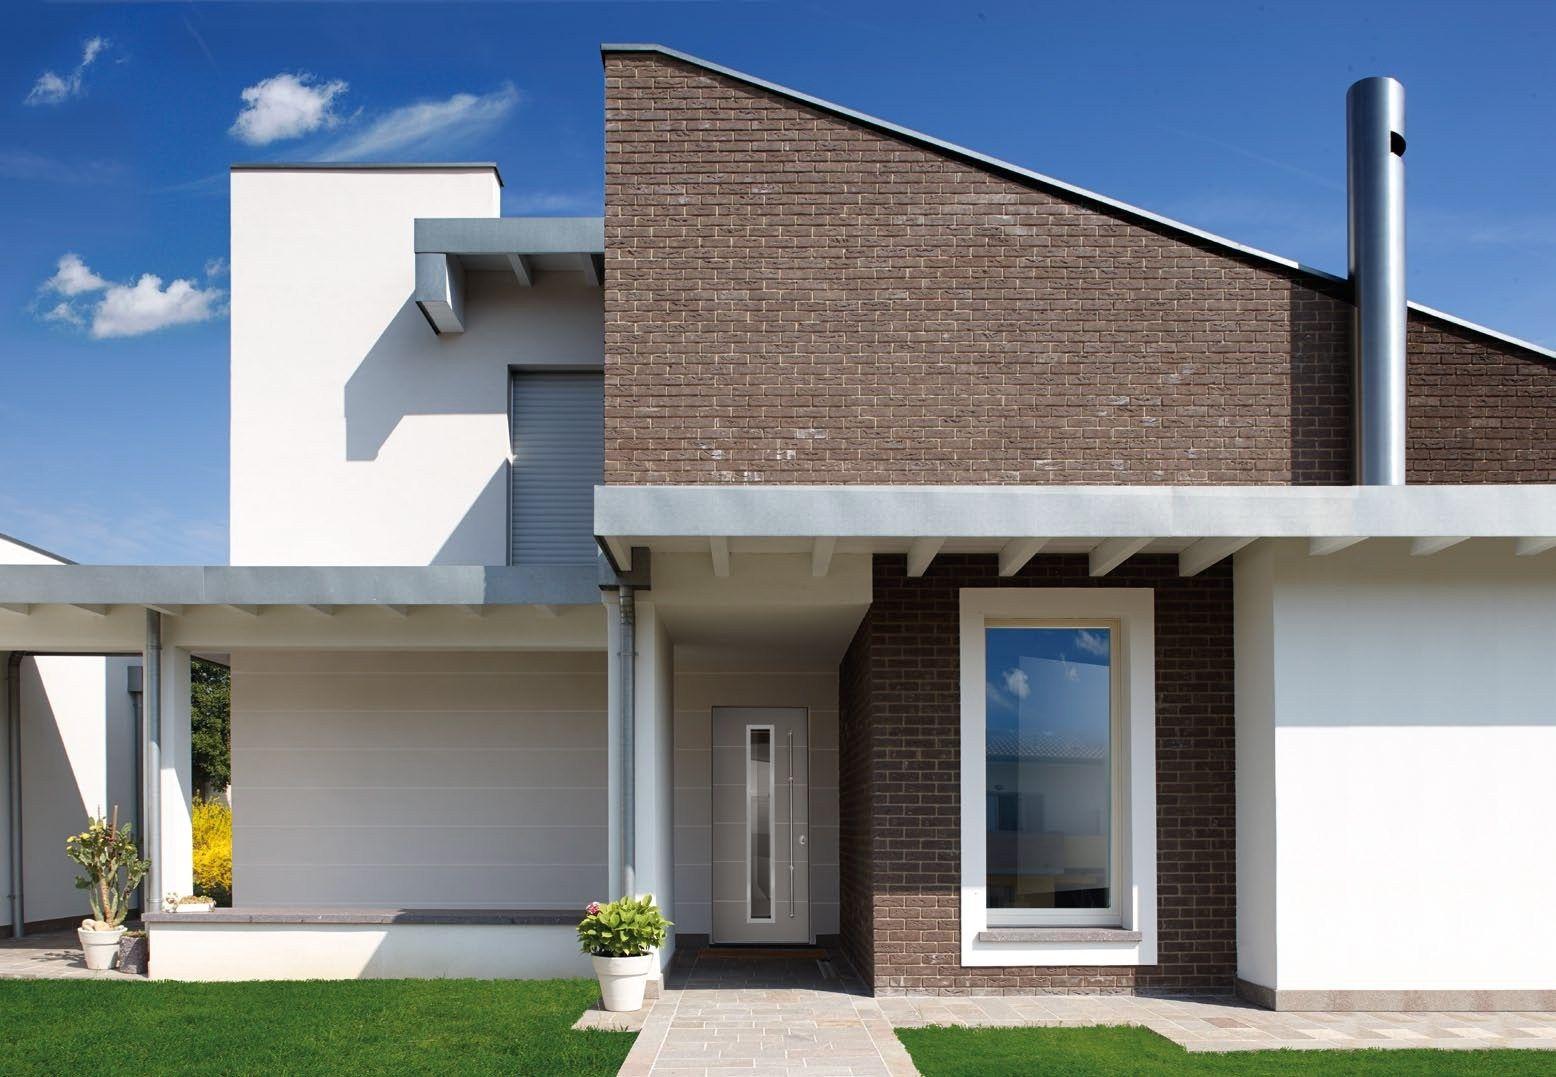 Porta d 39 ingresso blindata con pannelli in vetro frame by for Ingresso ville moderne